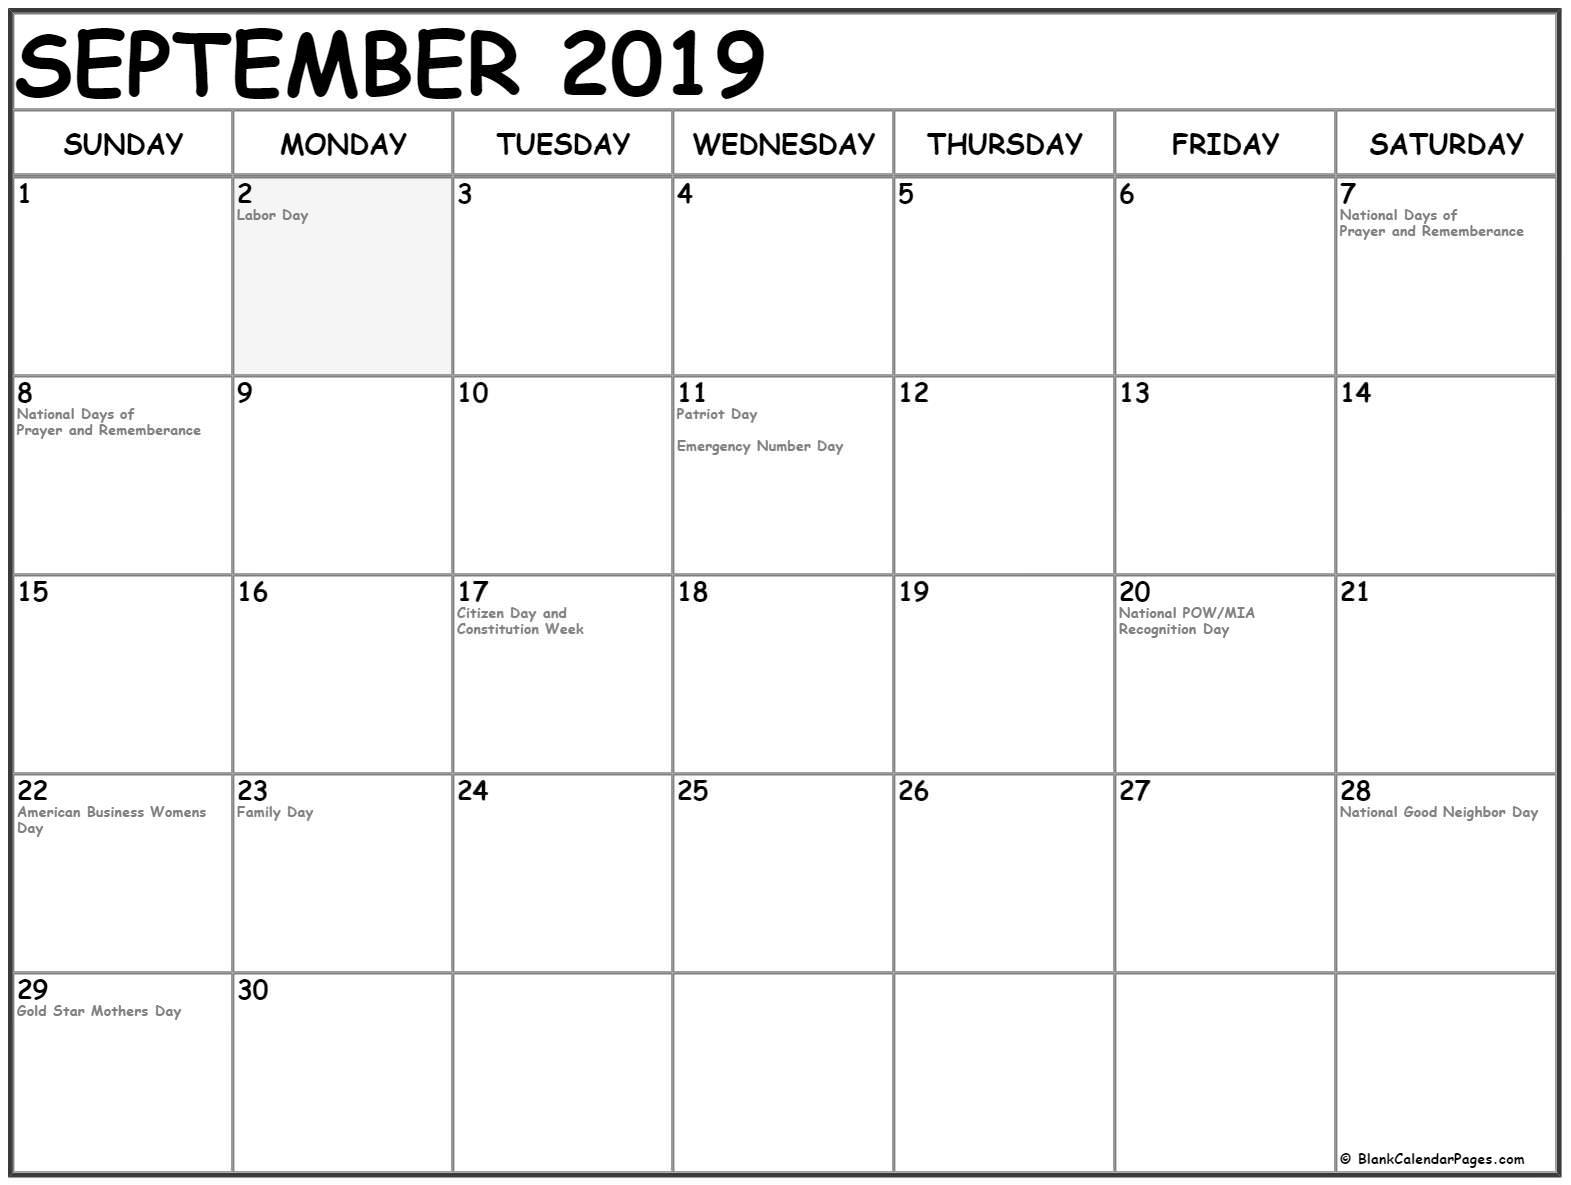 September 2019 Calendar With Holidays ✅ September 2019 Calendar with Holidays USA UK Canada with